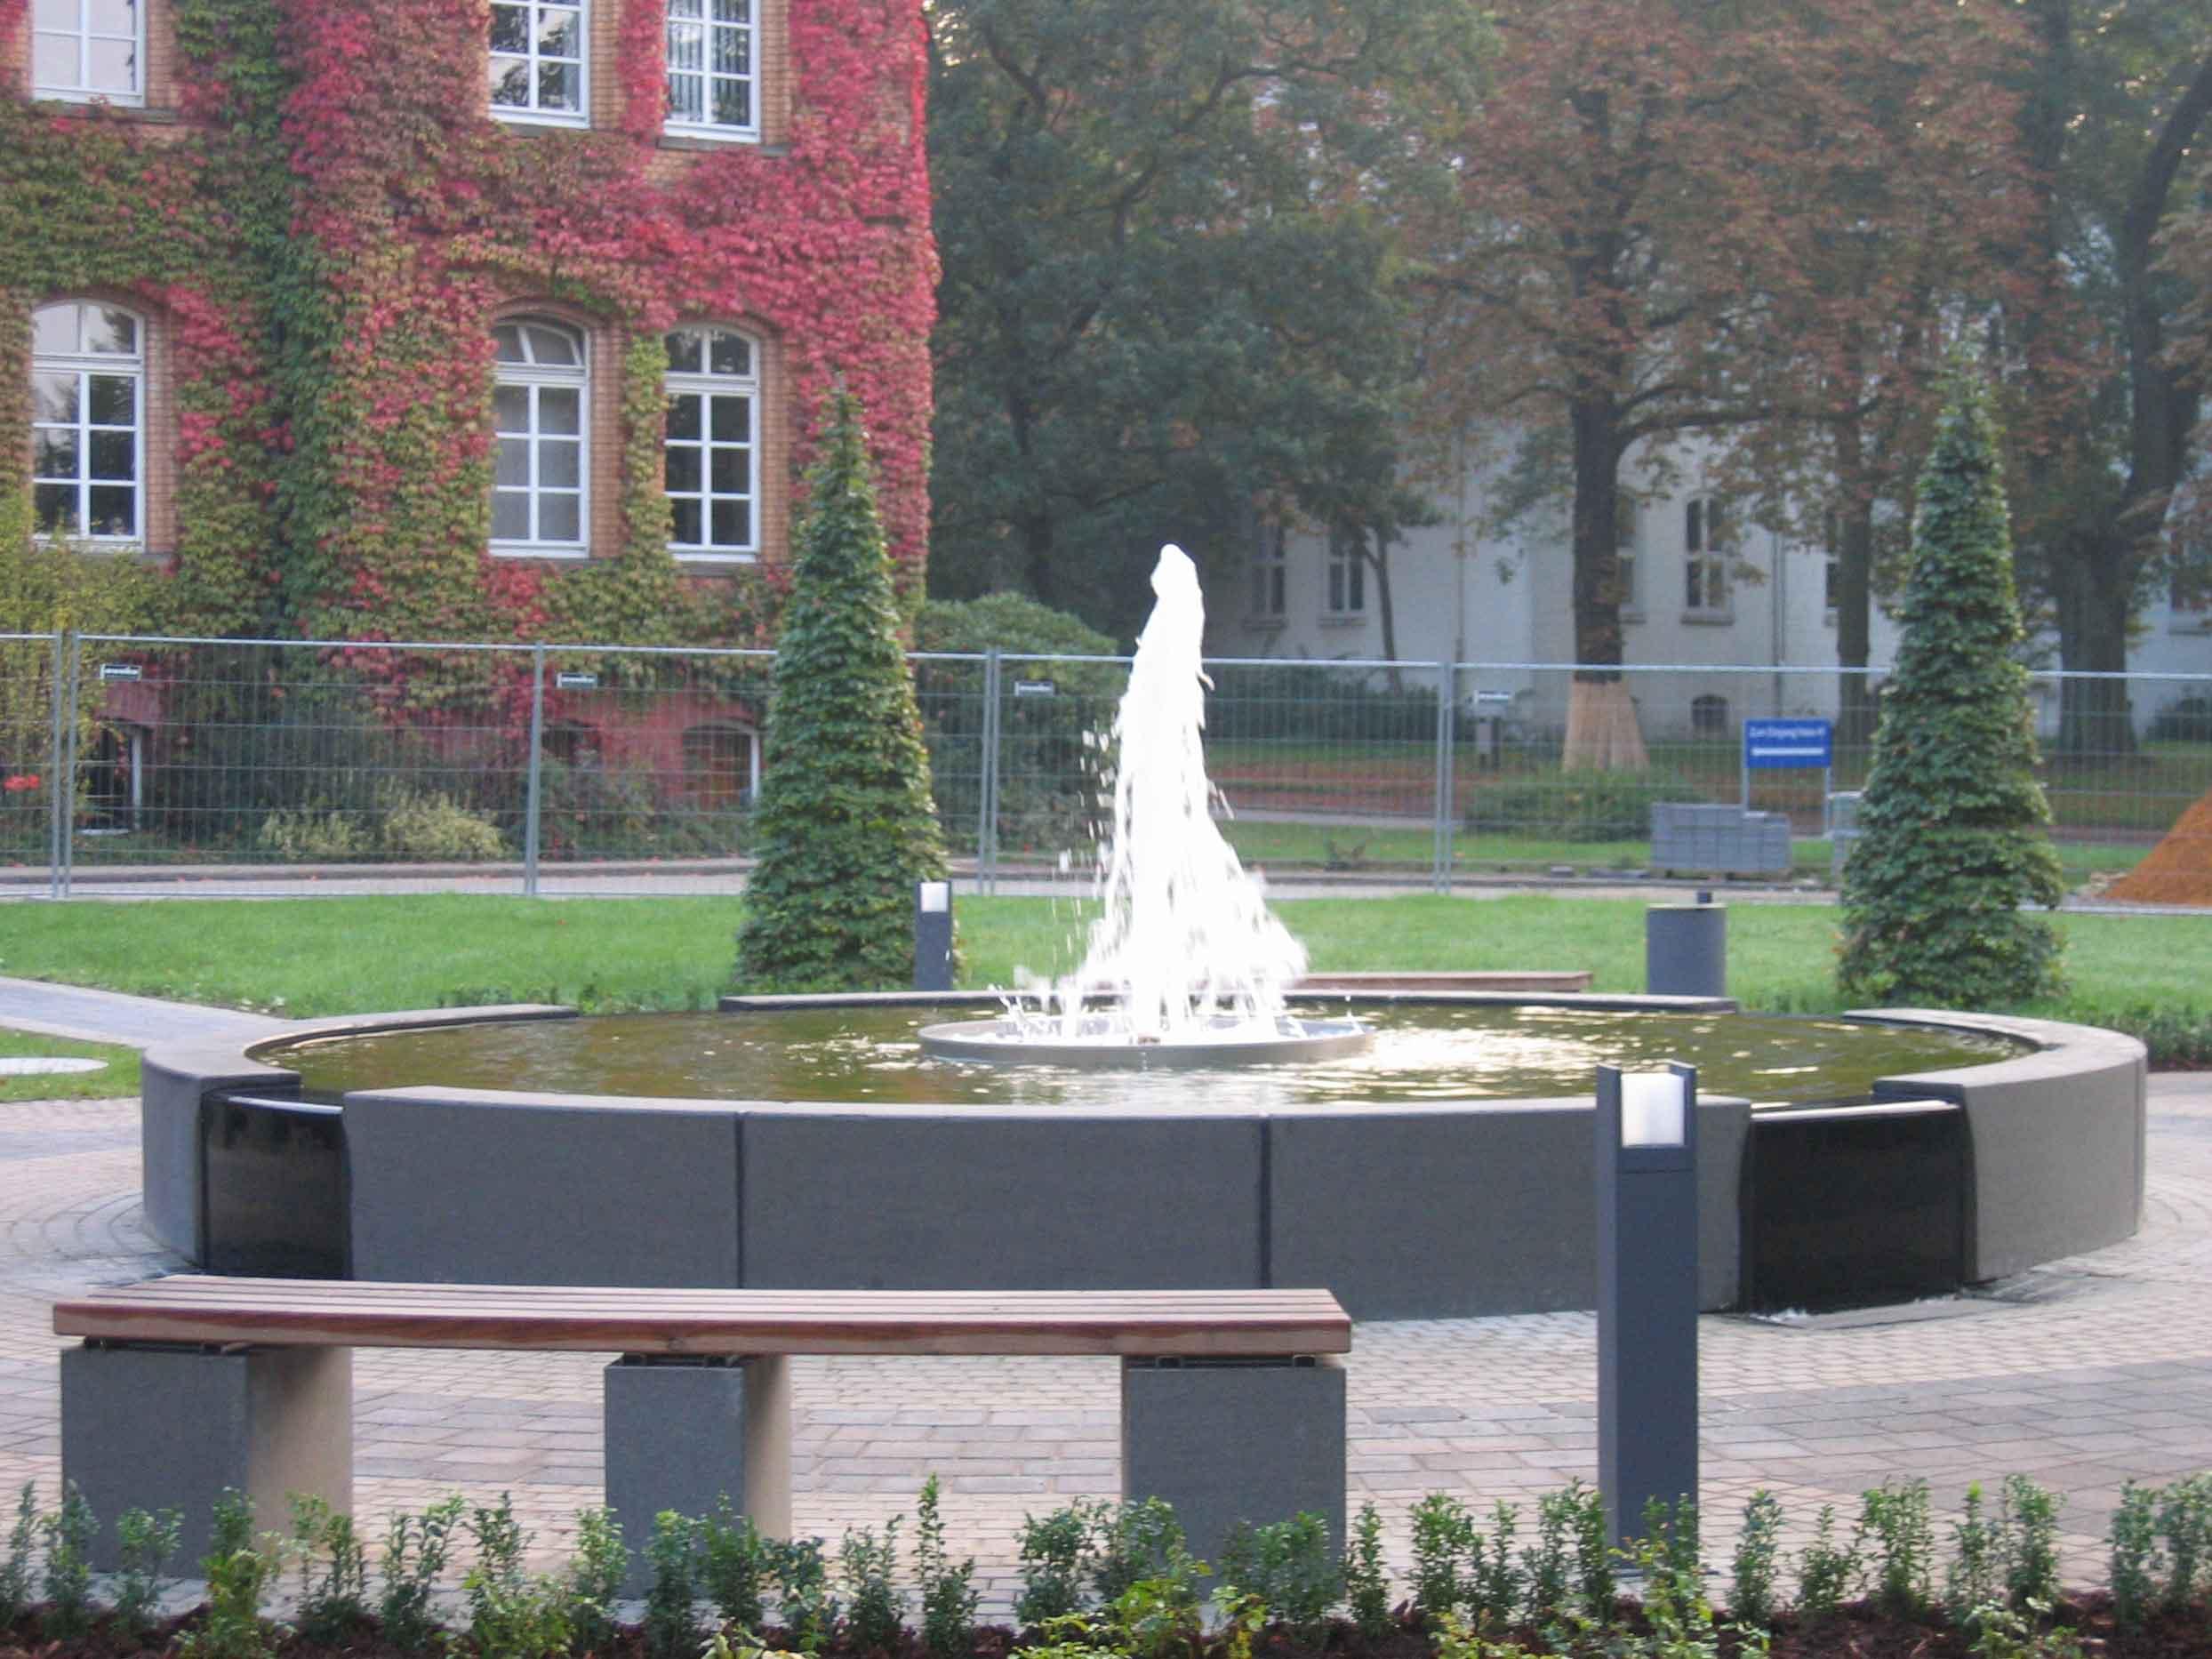 runder-kaskadenbrunnen1_4x3_web.jpg